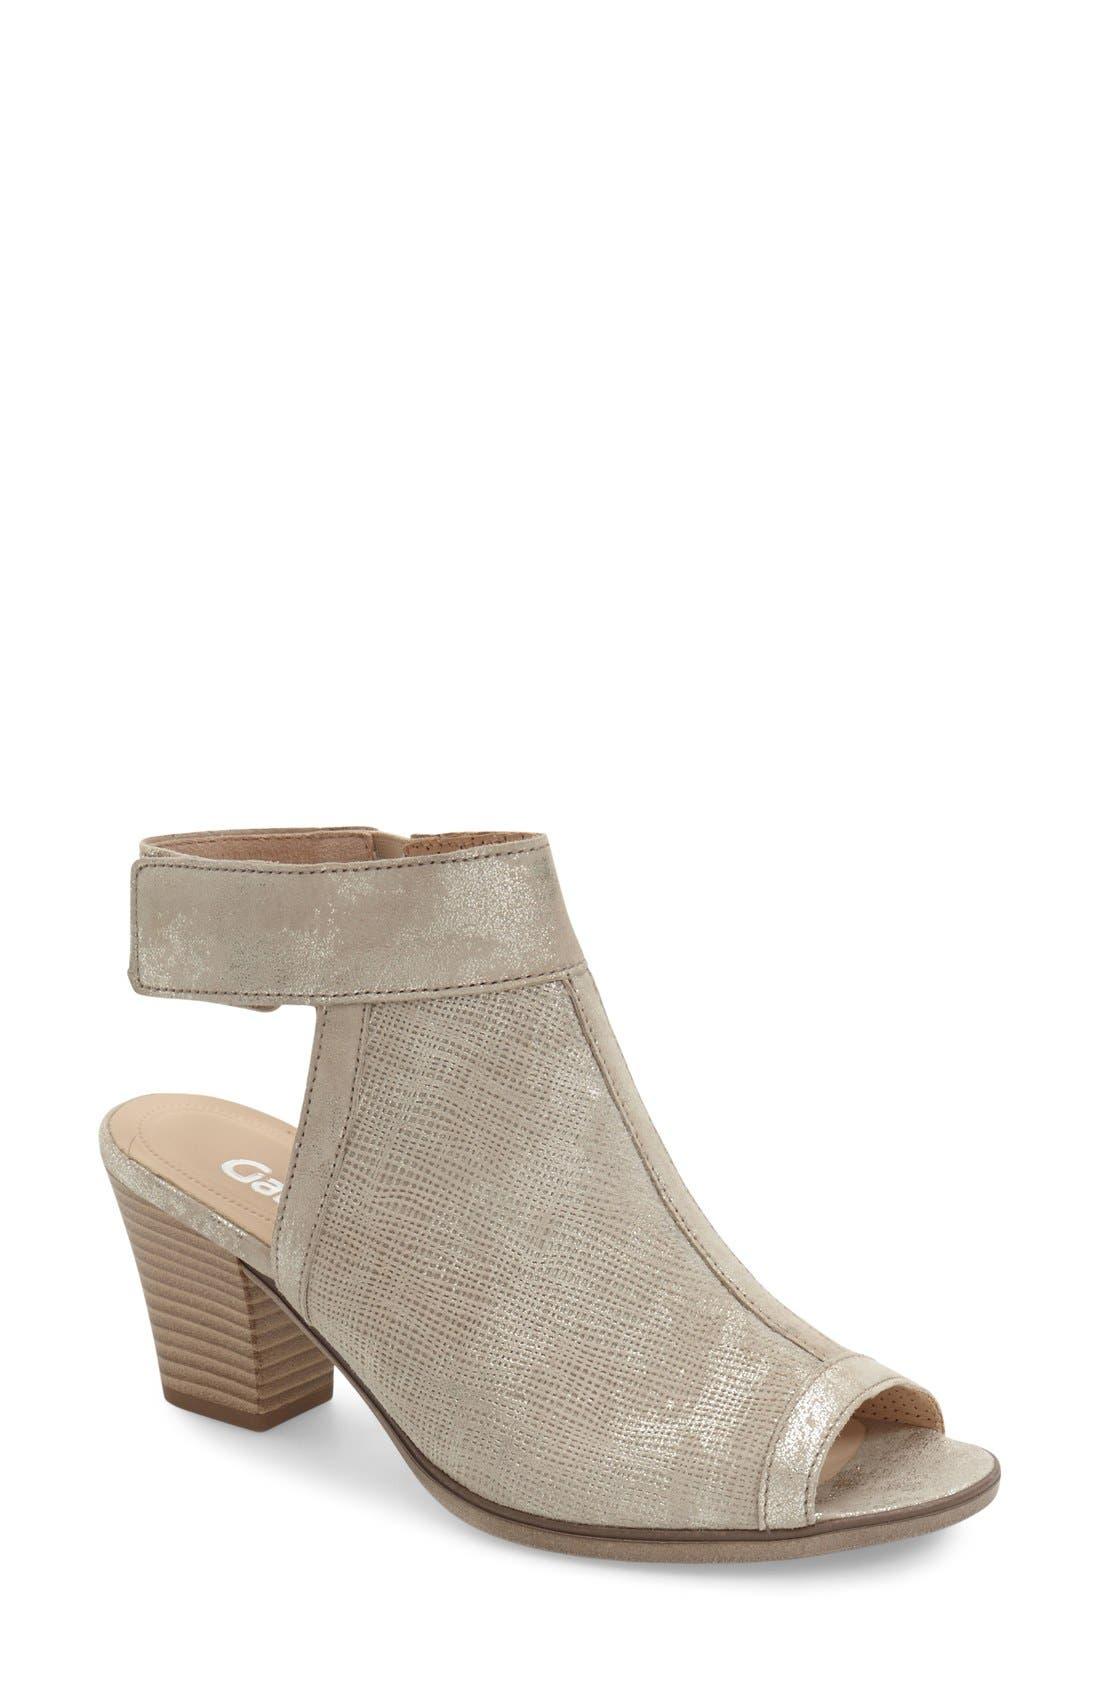 Main Image - Gabor Open Toe Leather Sandal (Women)